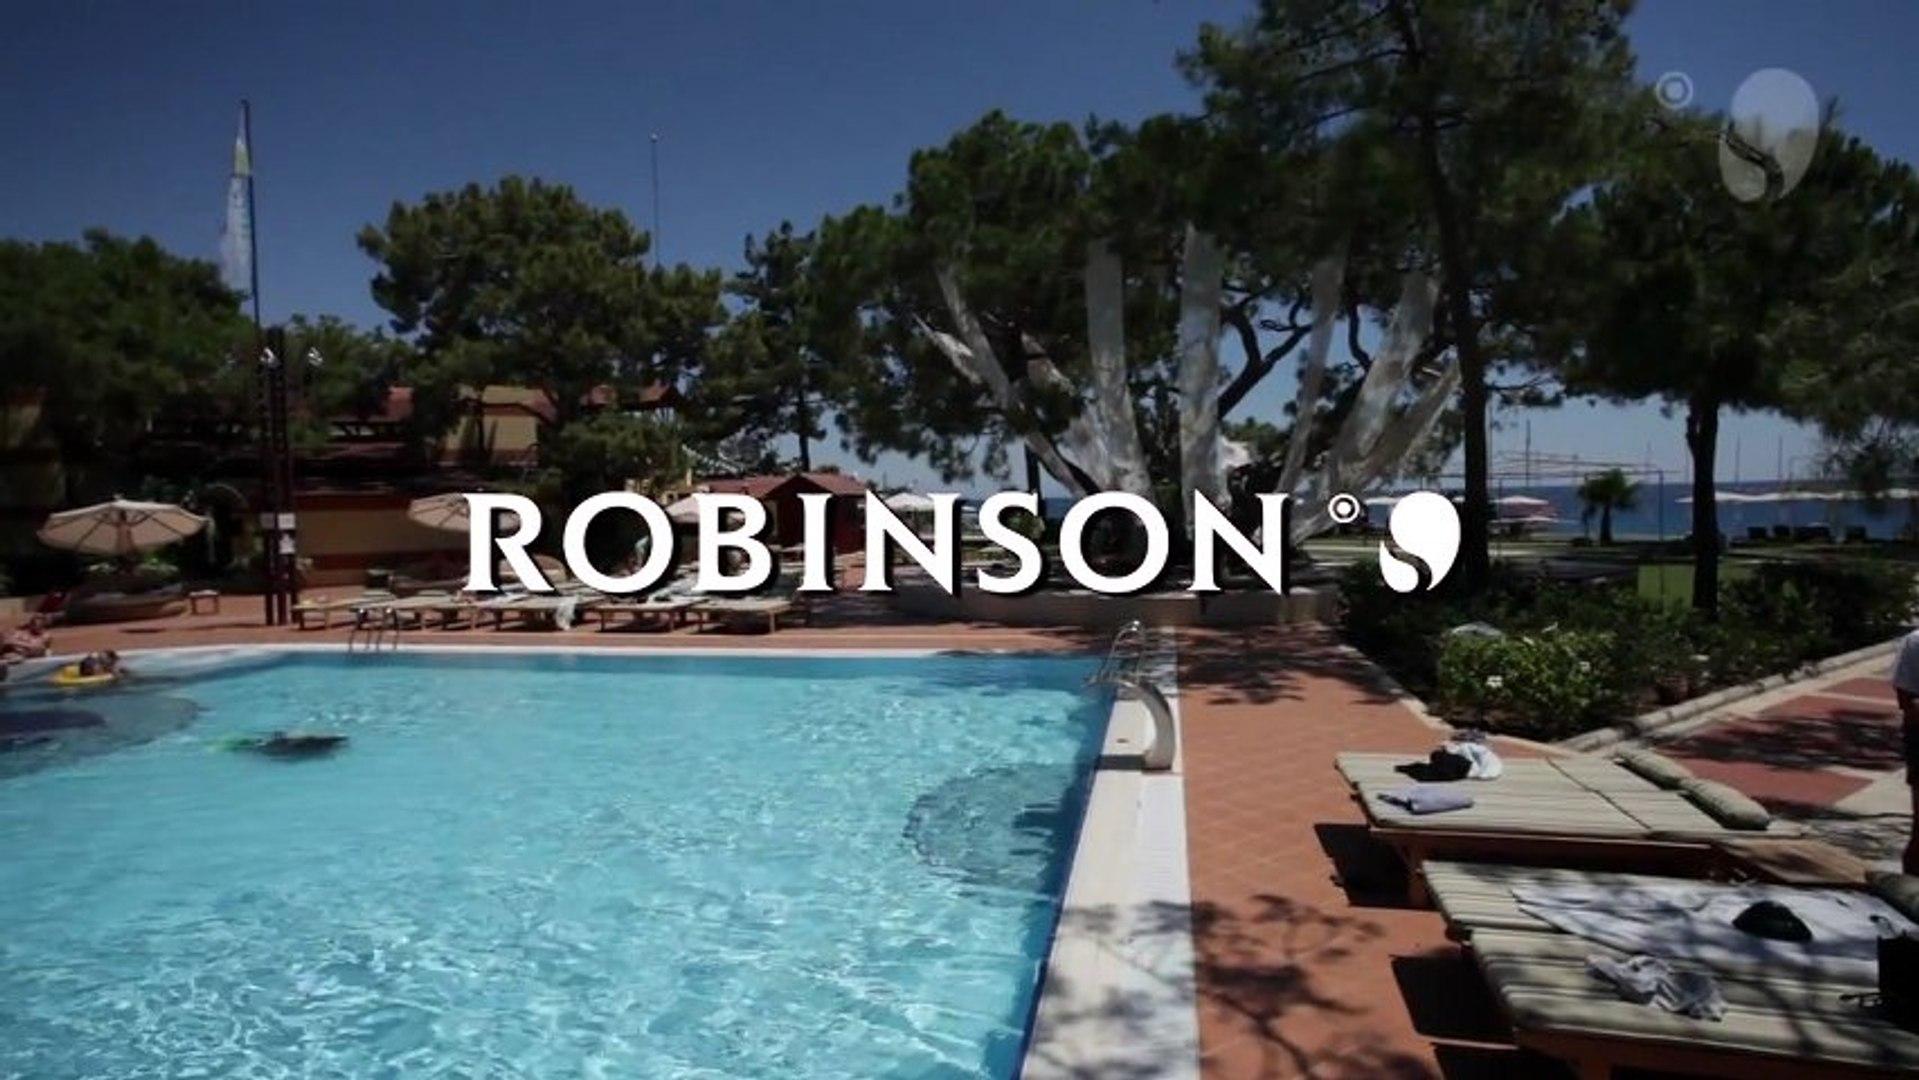 ROBINSON TOP Event WellFit Turkey 2012 Robinson Clubs Sport & Party